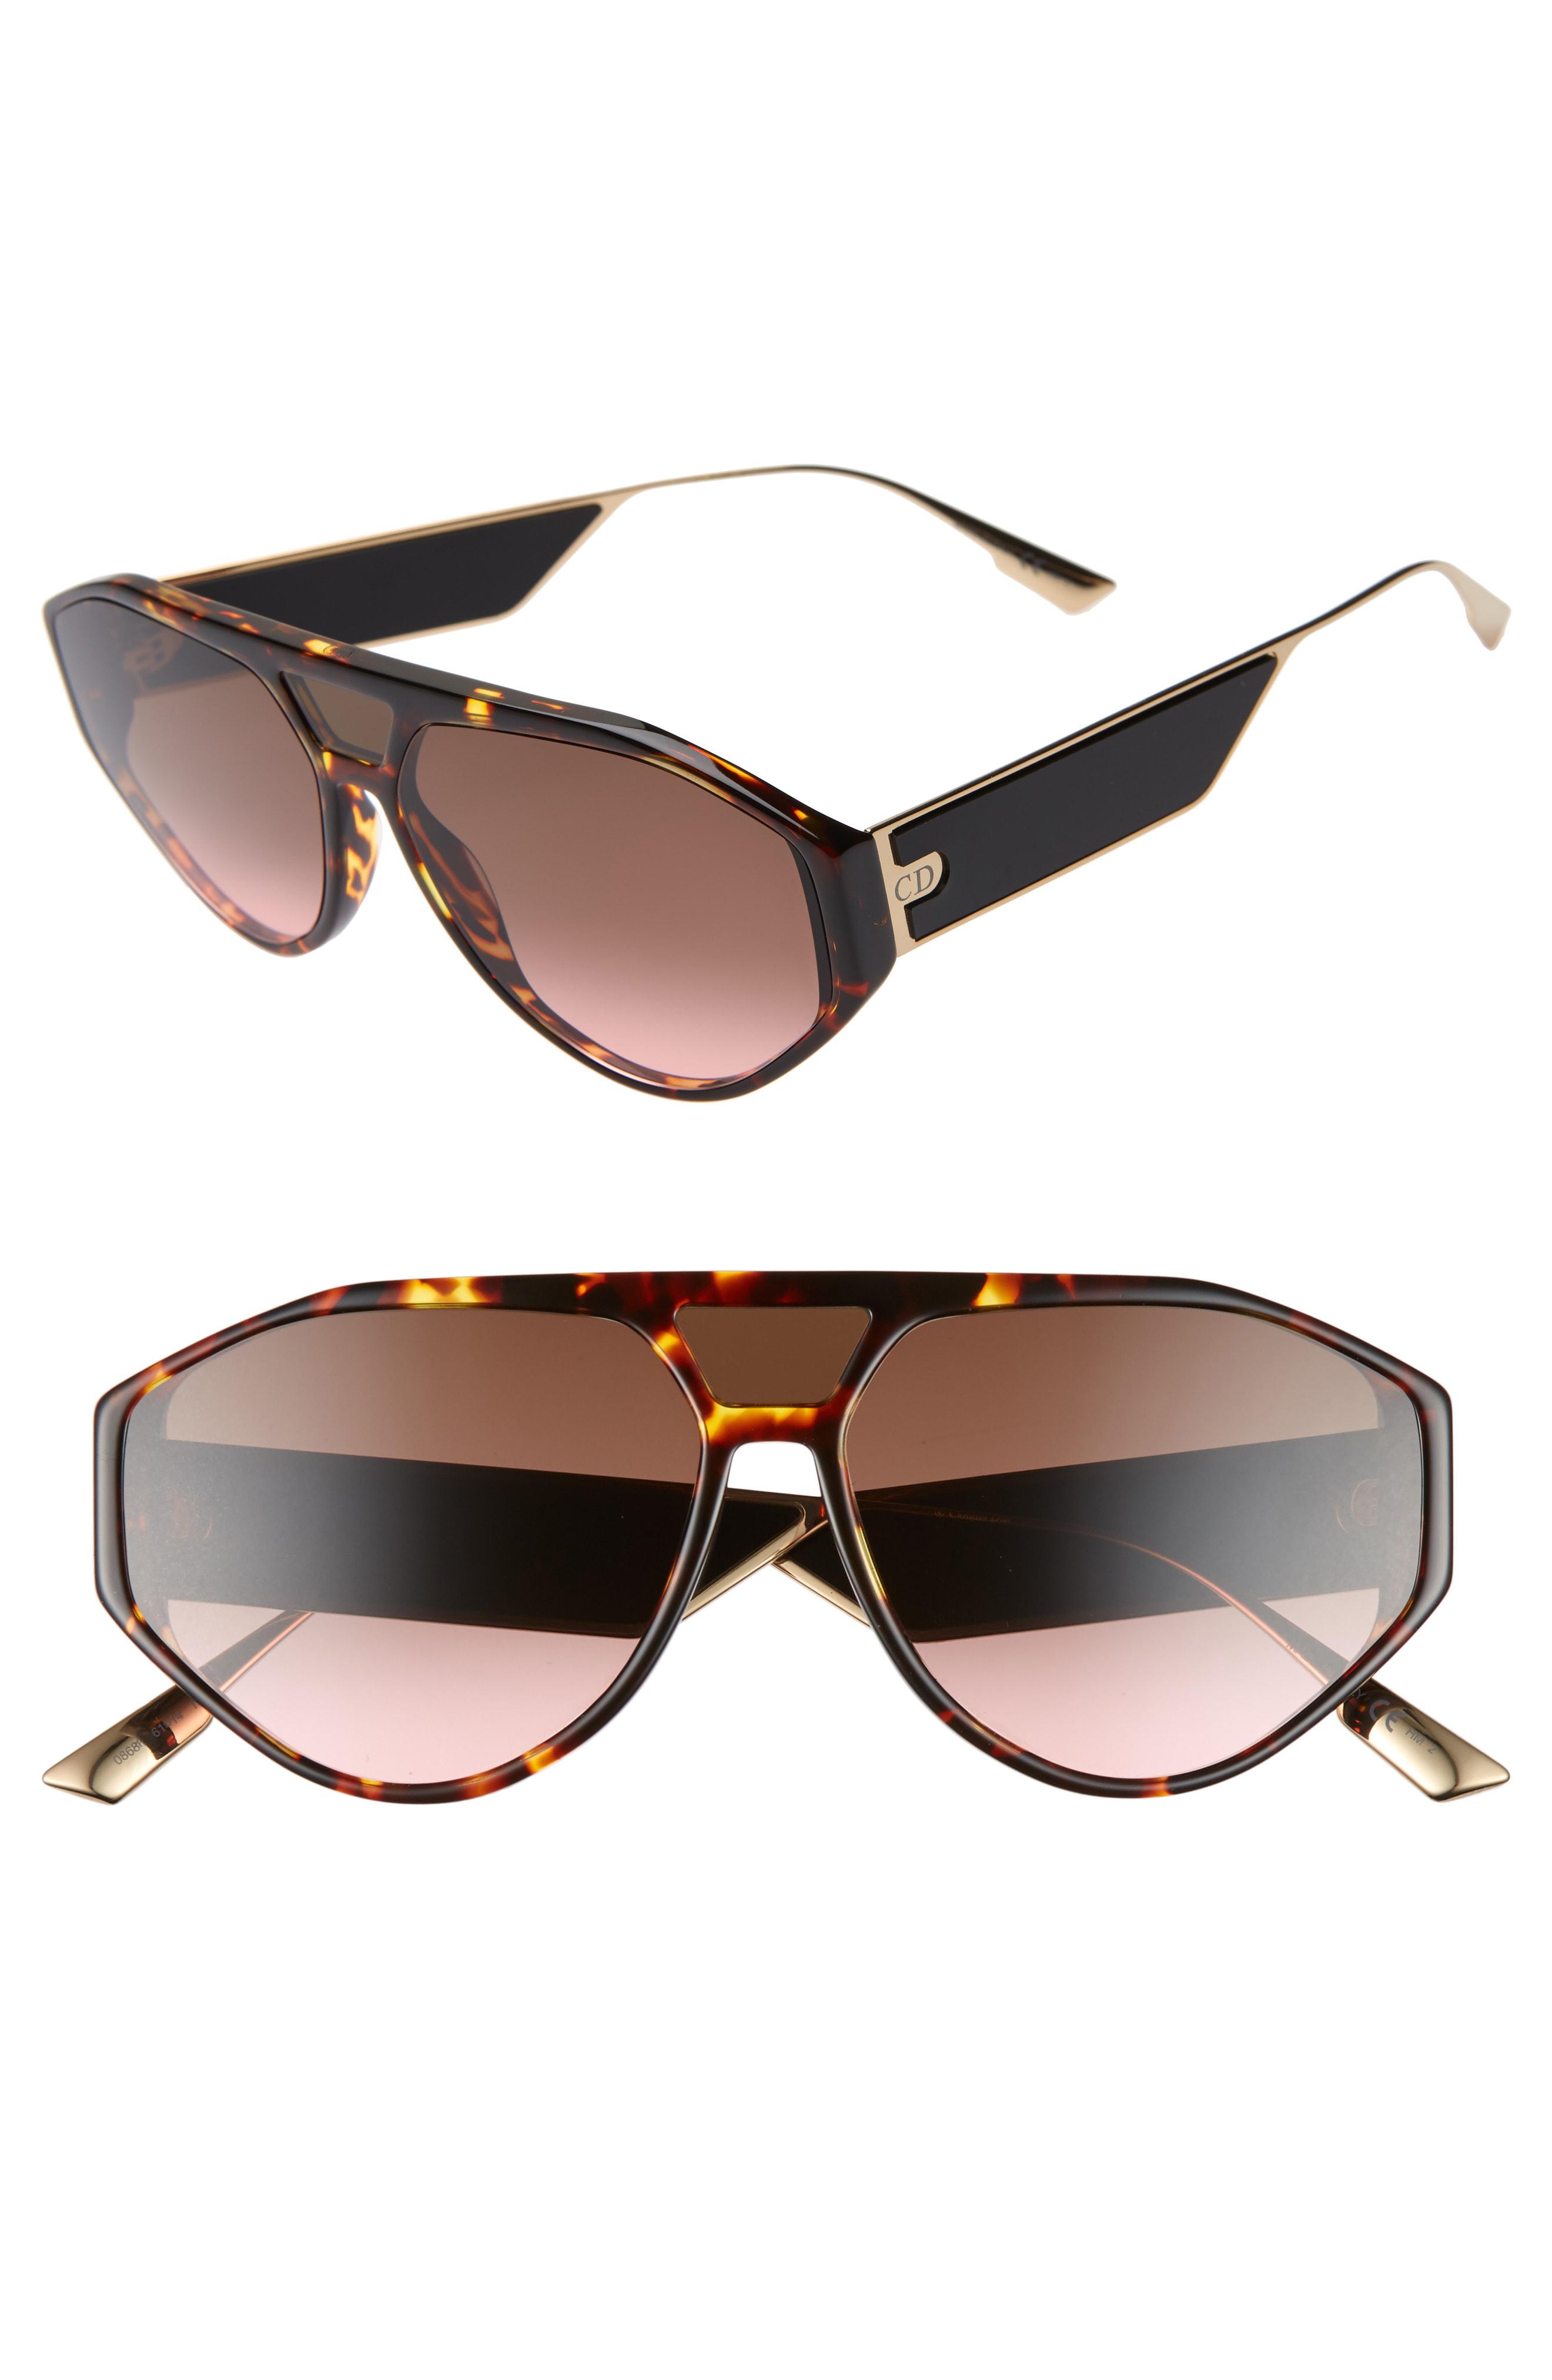 c14c84ca2 Dior 61Mm Aviator Sunglasses - Dark Havana/ Pink | ModeSens